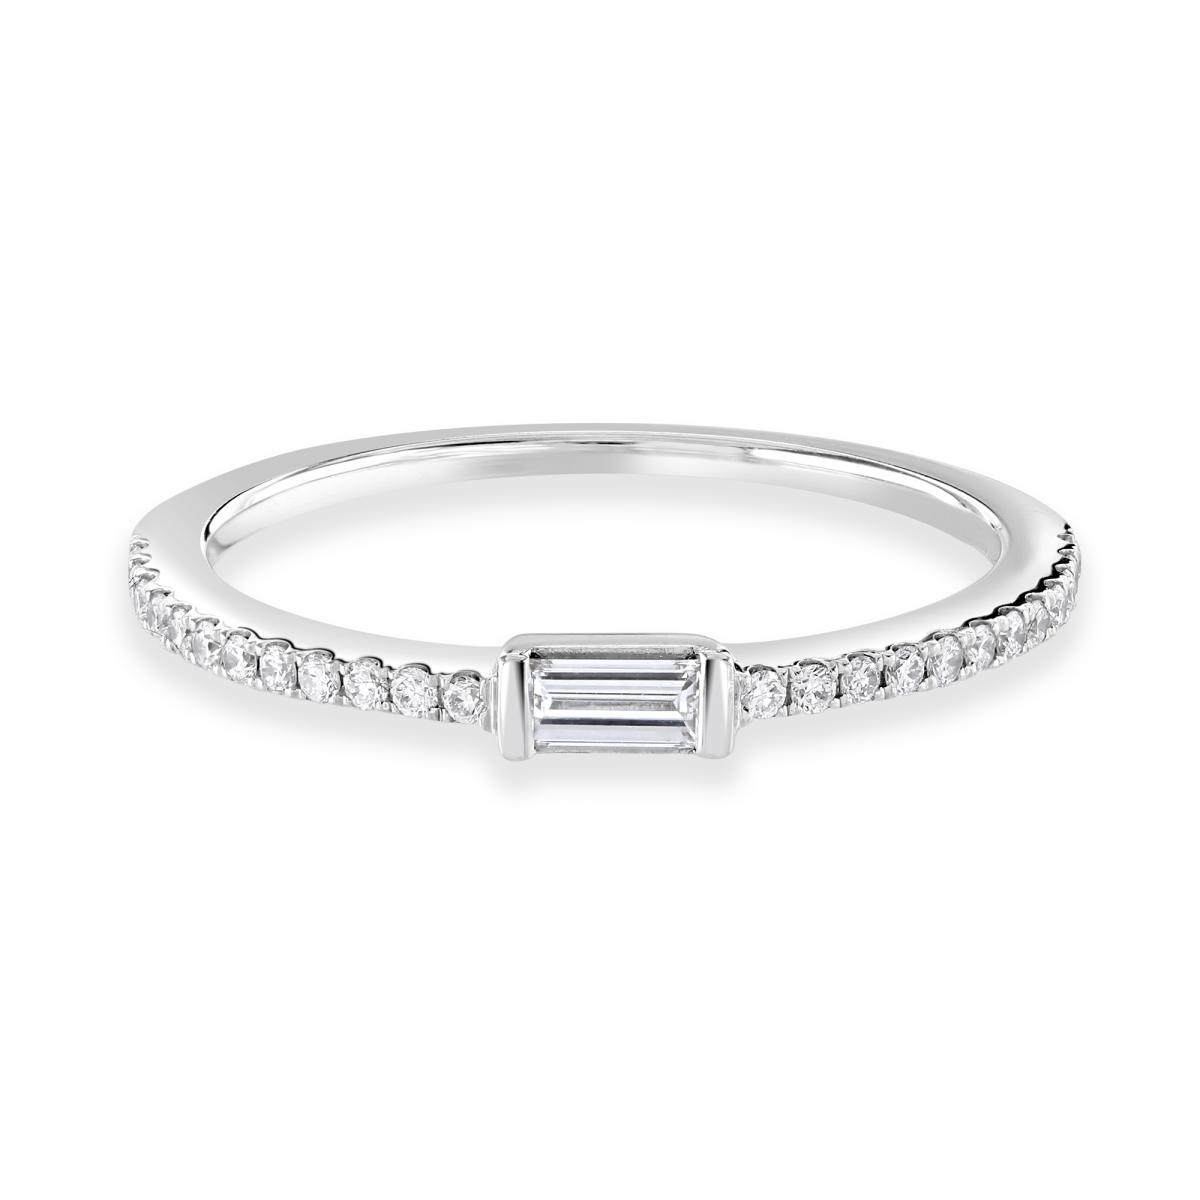 Baguette Cut White Gold Diamond Stacking Ring